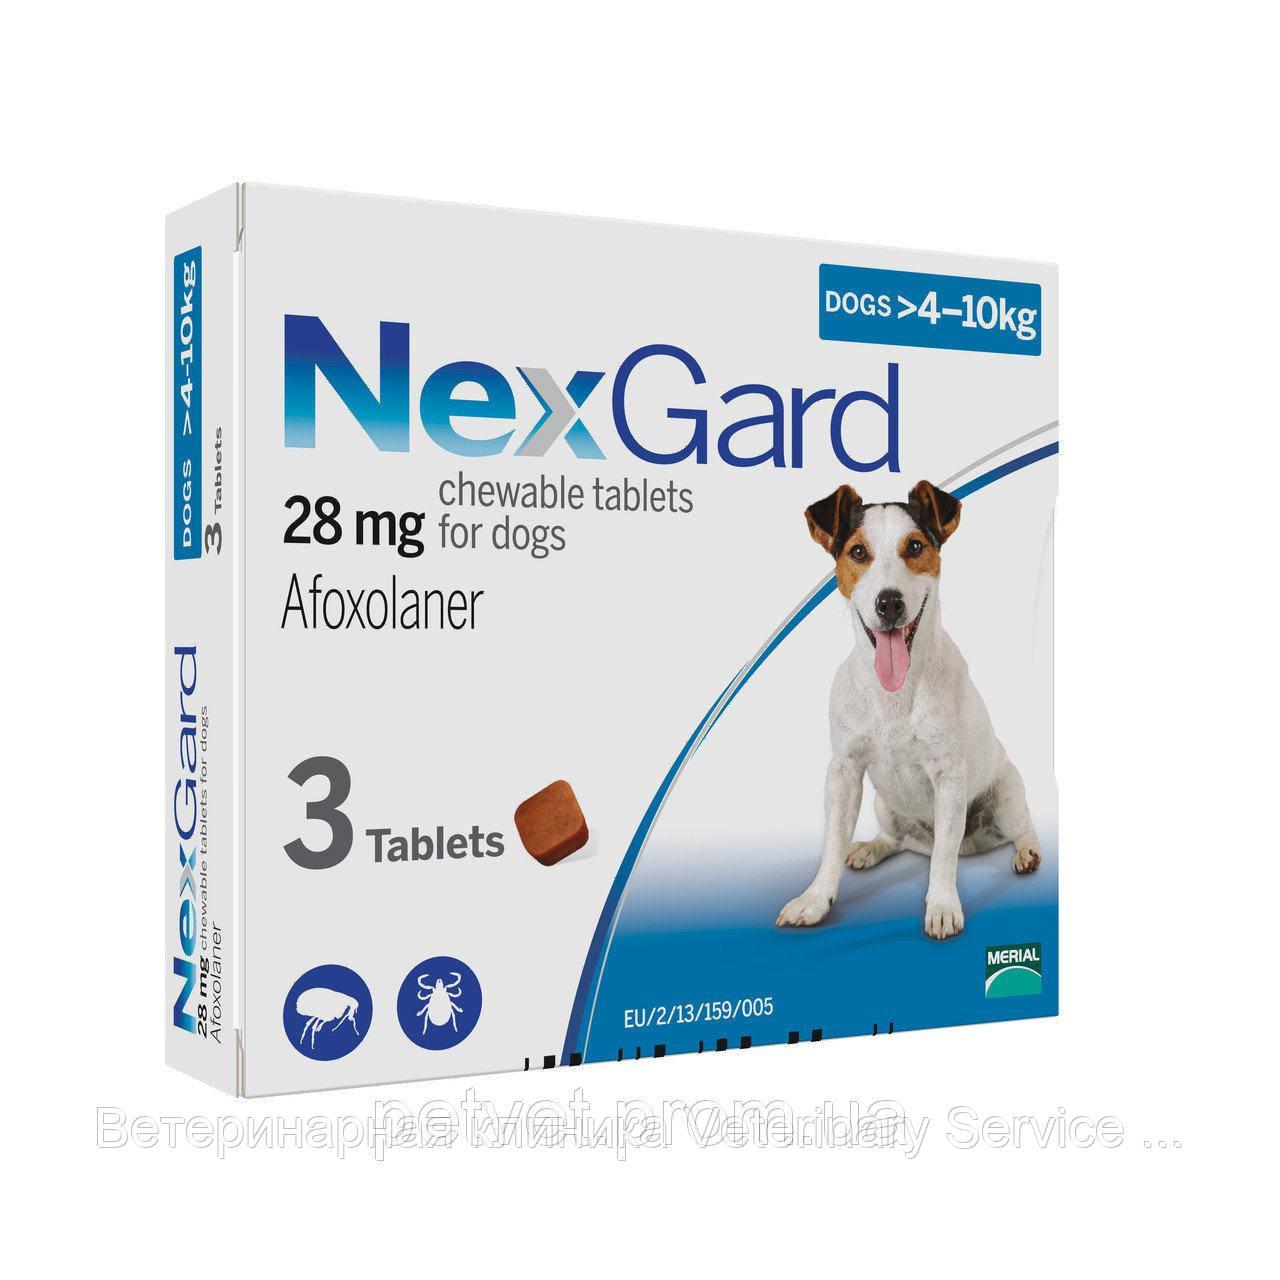 НексГард 4 - 10 кг